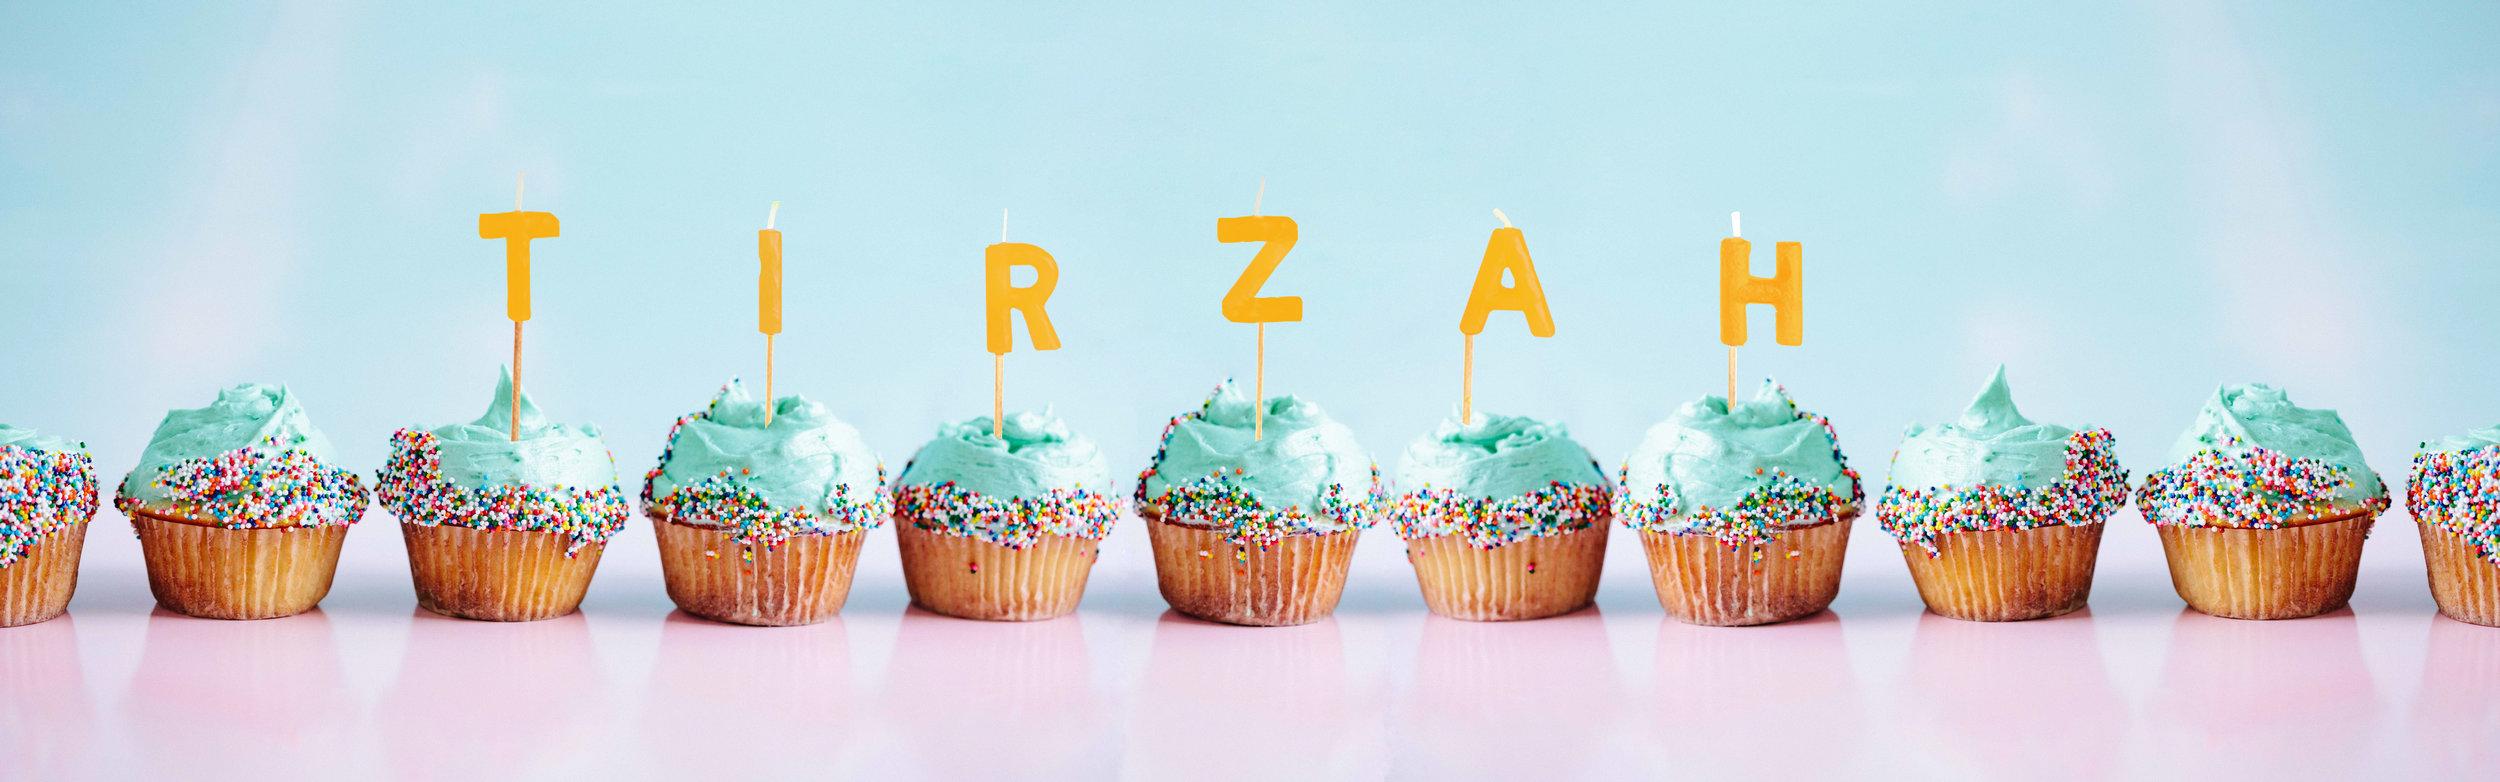 tirzah+7th+birthday+banner.jpg